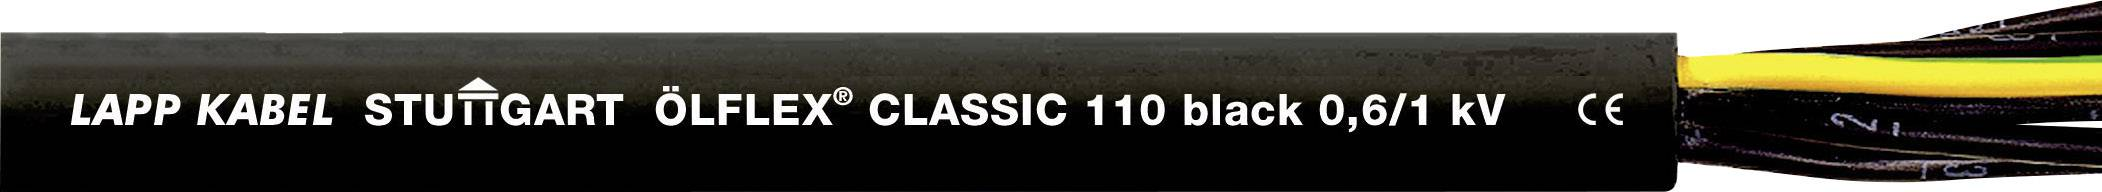 Riadiaci kábel LappKabel ÖLFLEX® CLASSIC BLACK 110 1120248, 12 G 0.75 mm², vonkajší Ø 13.40 mm, 1000 V, metrový tovar, čierna